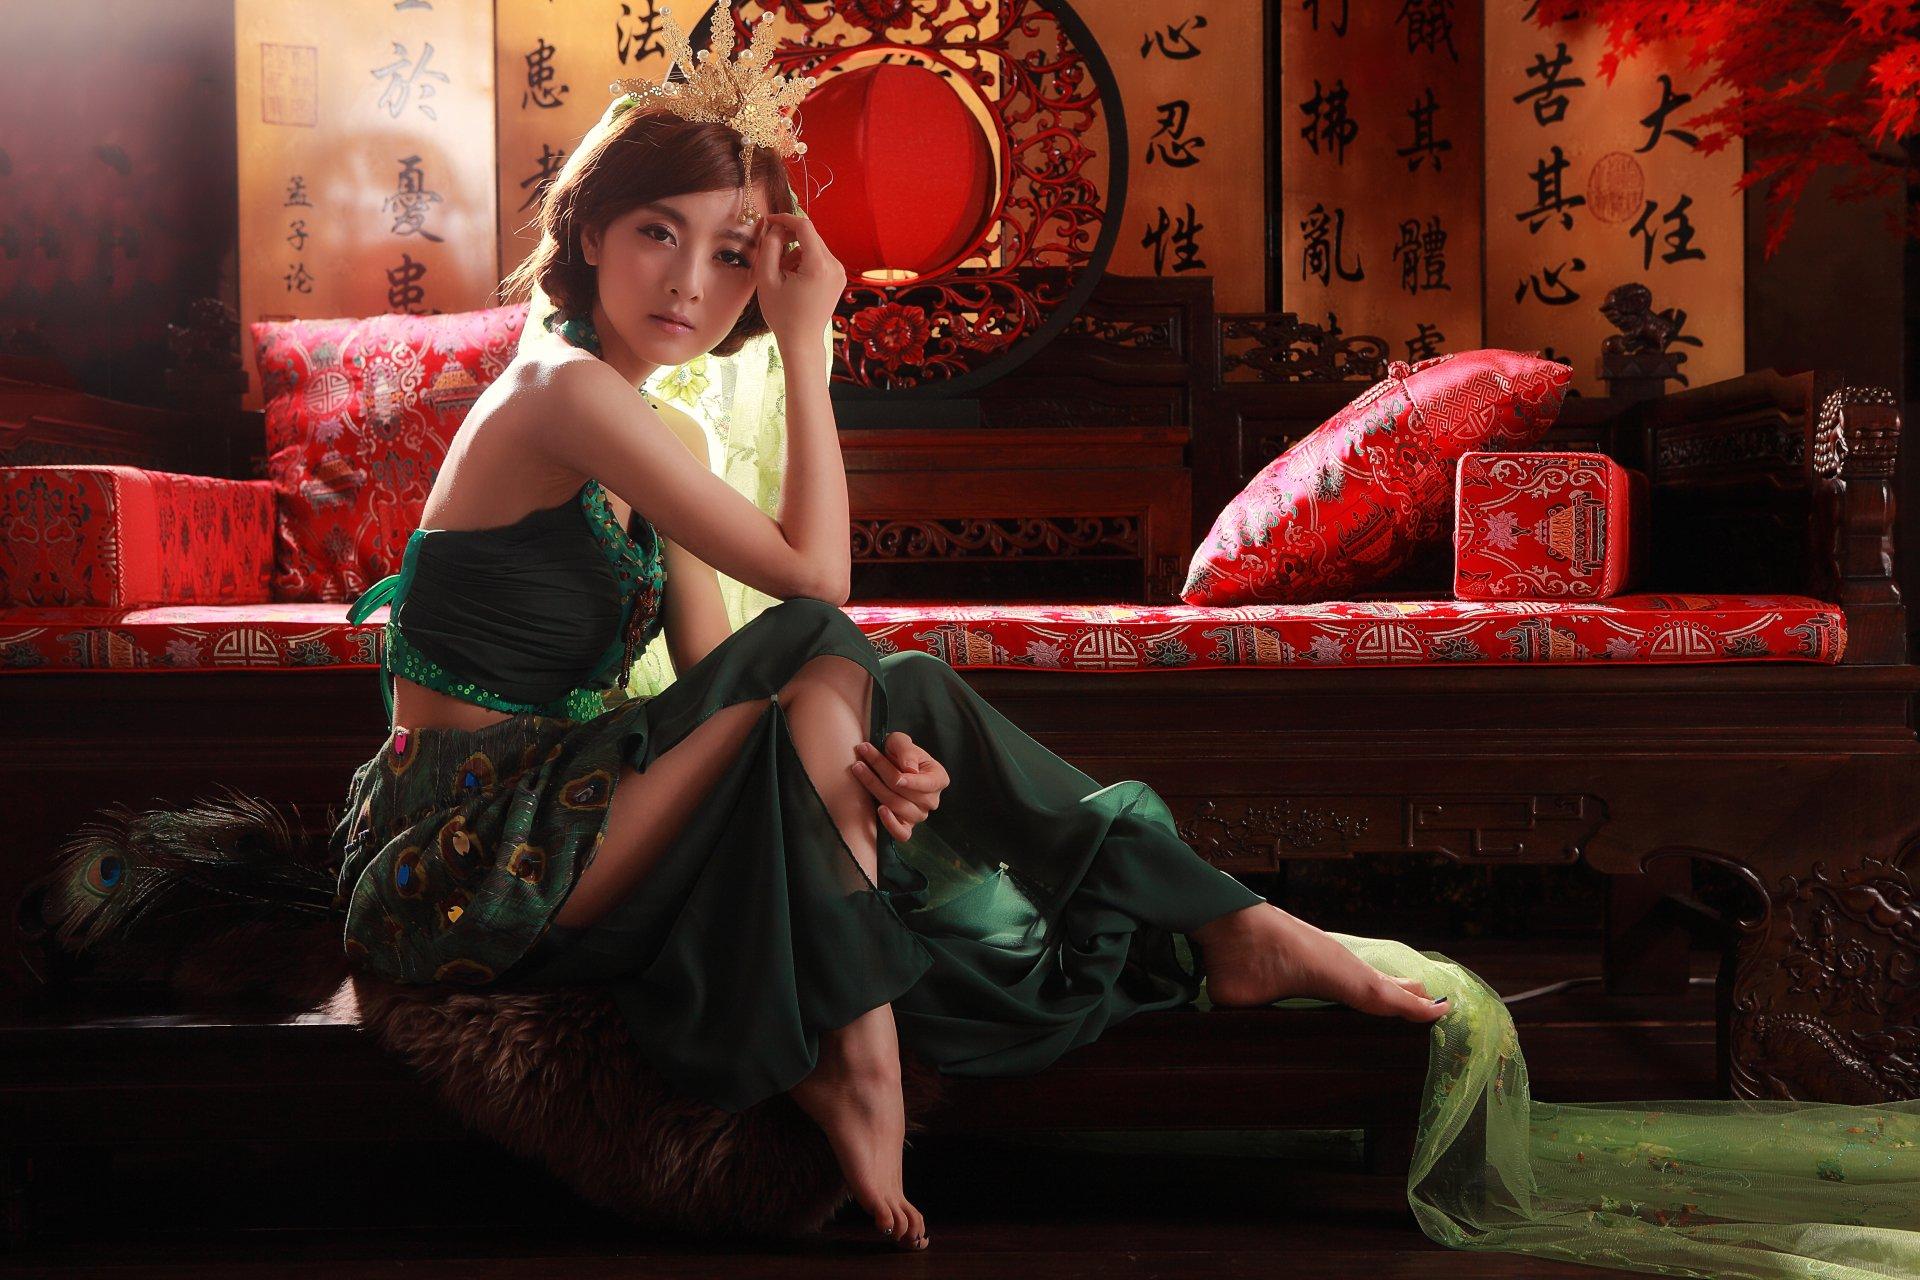 Women - Mikako Zhang Kaijie  Taiwanese Mikao Pillow Sofa Skirt Asian Girl Wallpaper